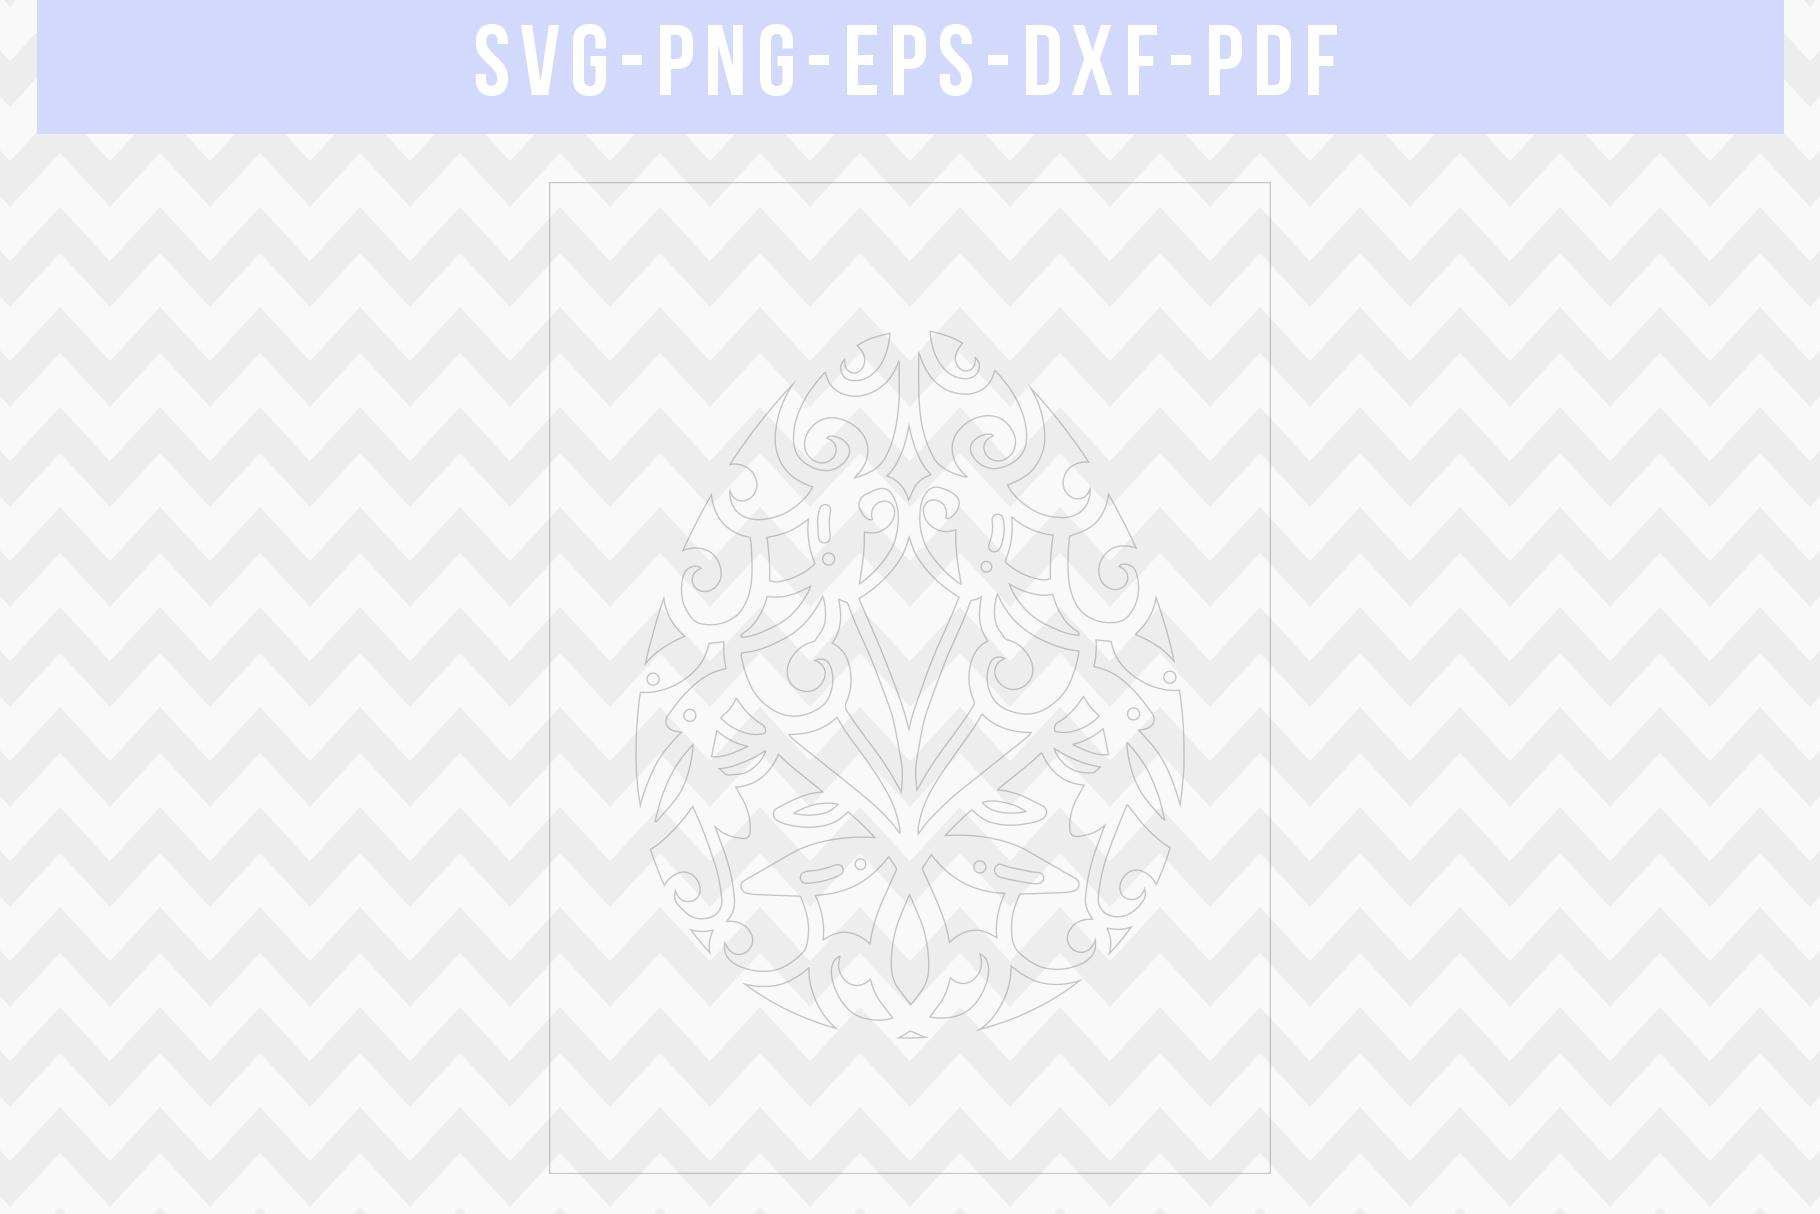 Easter Egg Frame Papercut Template, Metal Decor, SVG, PDF example image 2